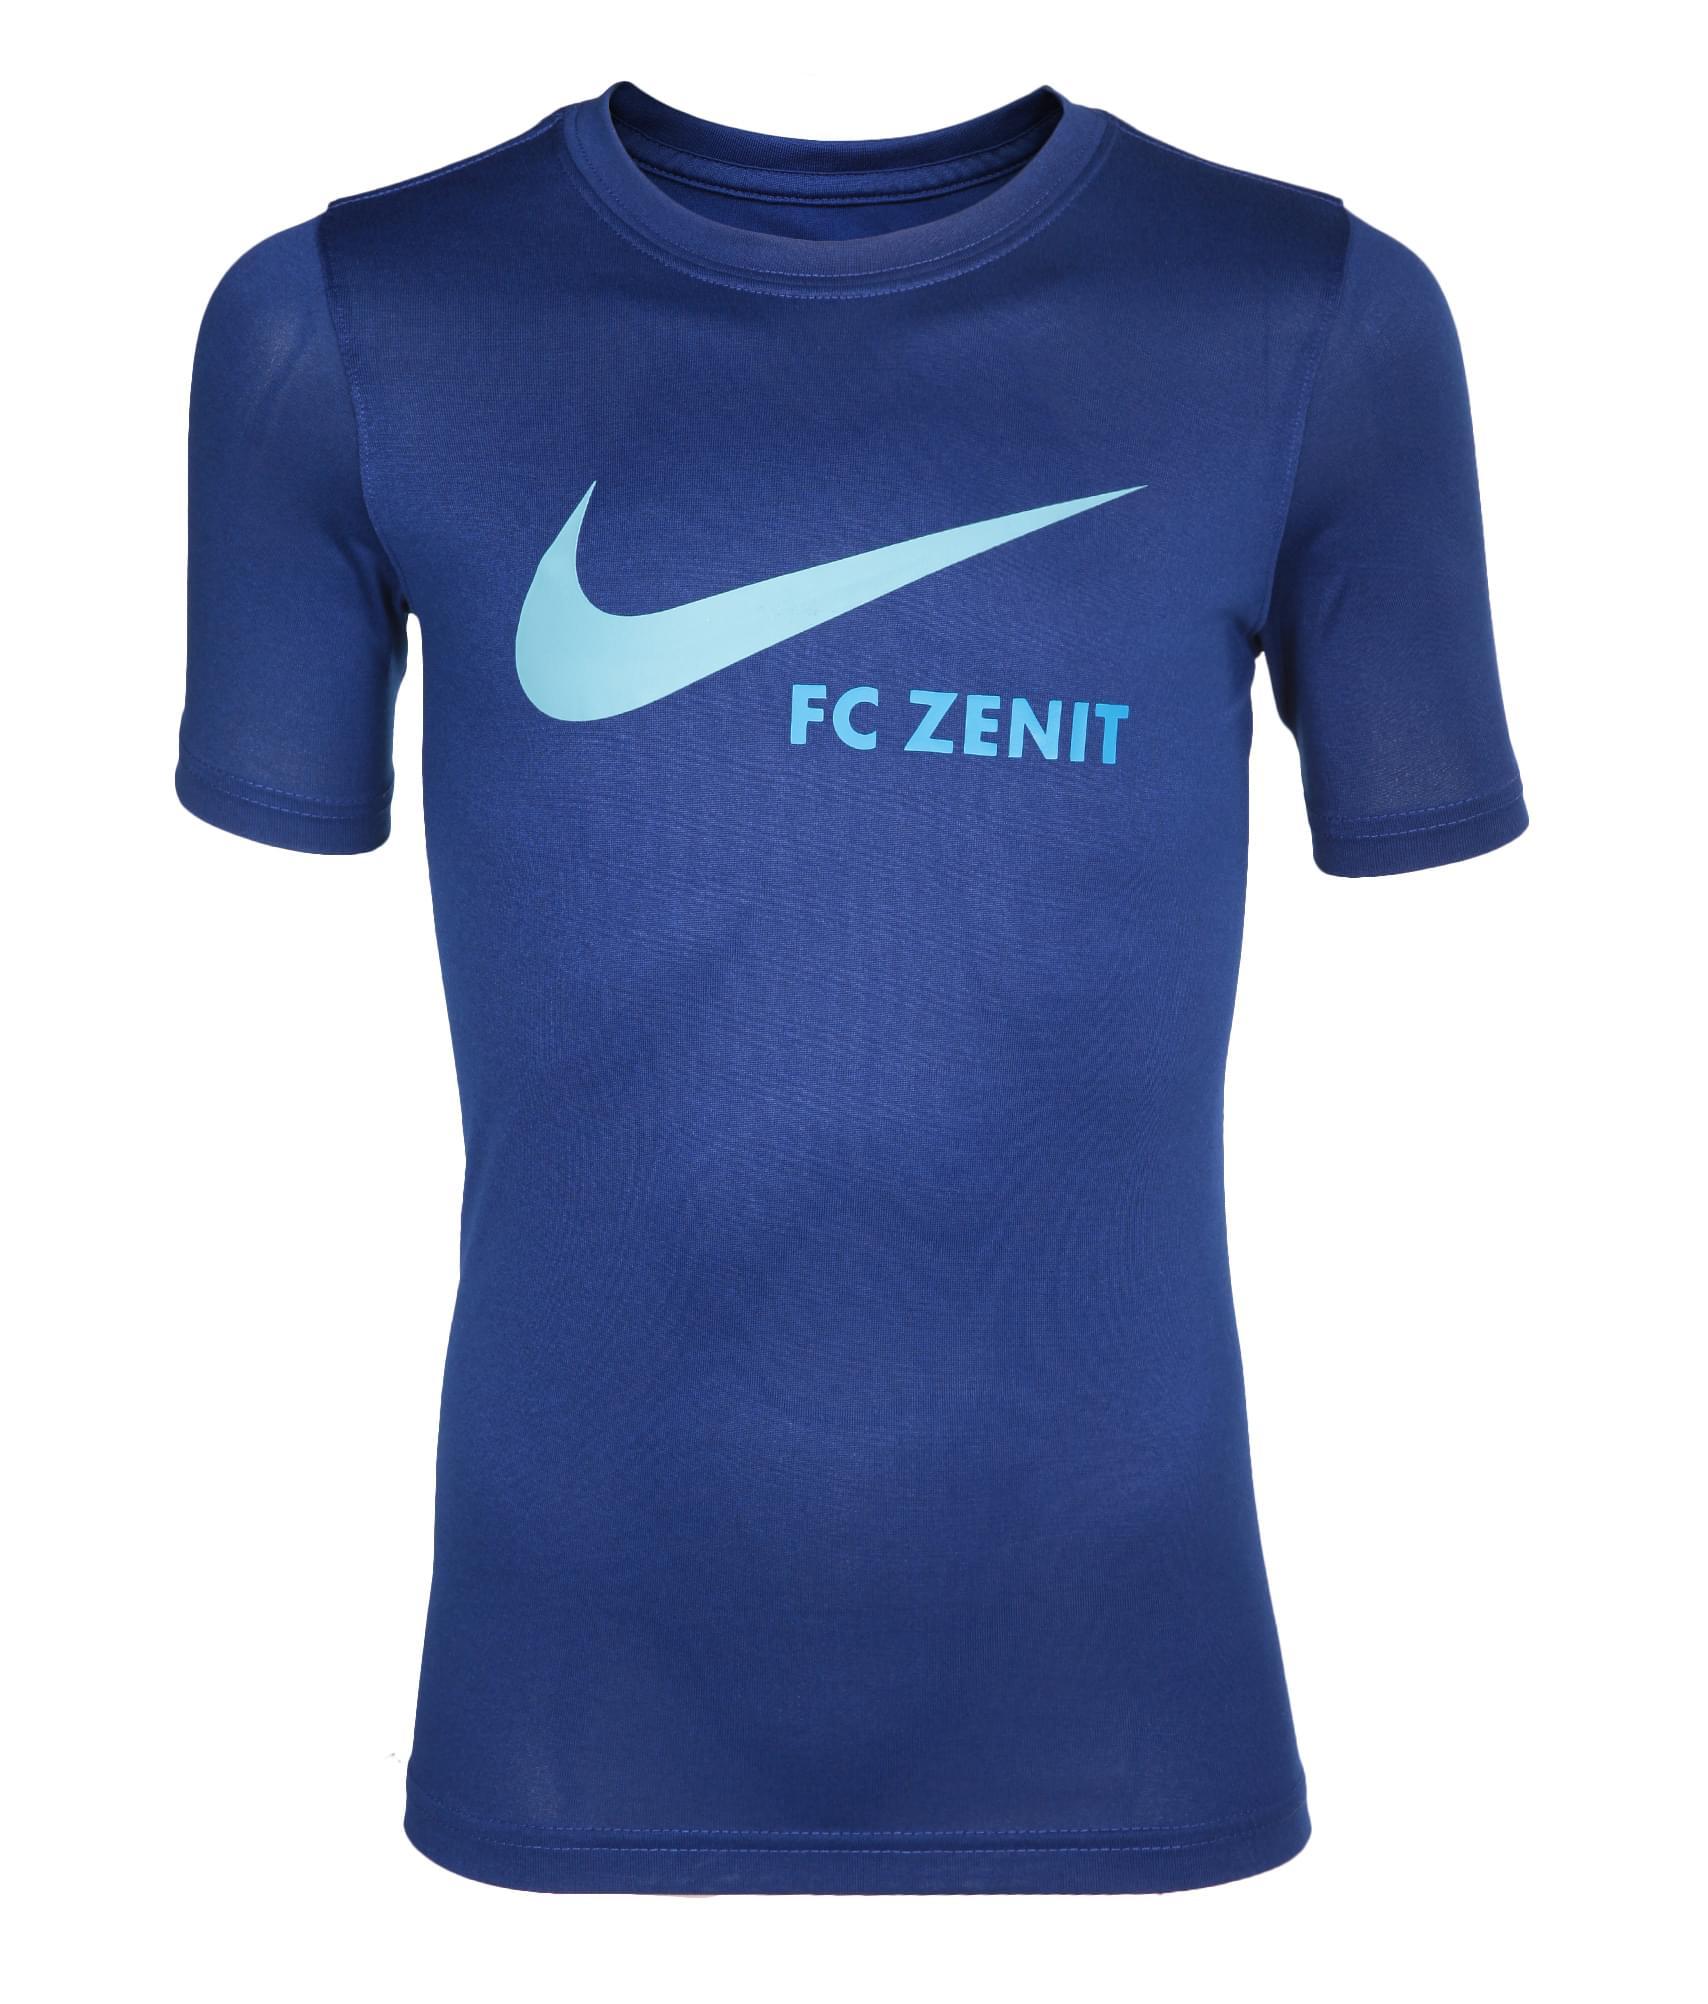 Футболка подростковая Nike, Цвет-Синий, Размер-L спортивные лифчики найк